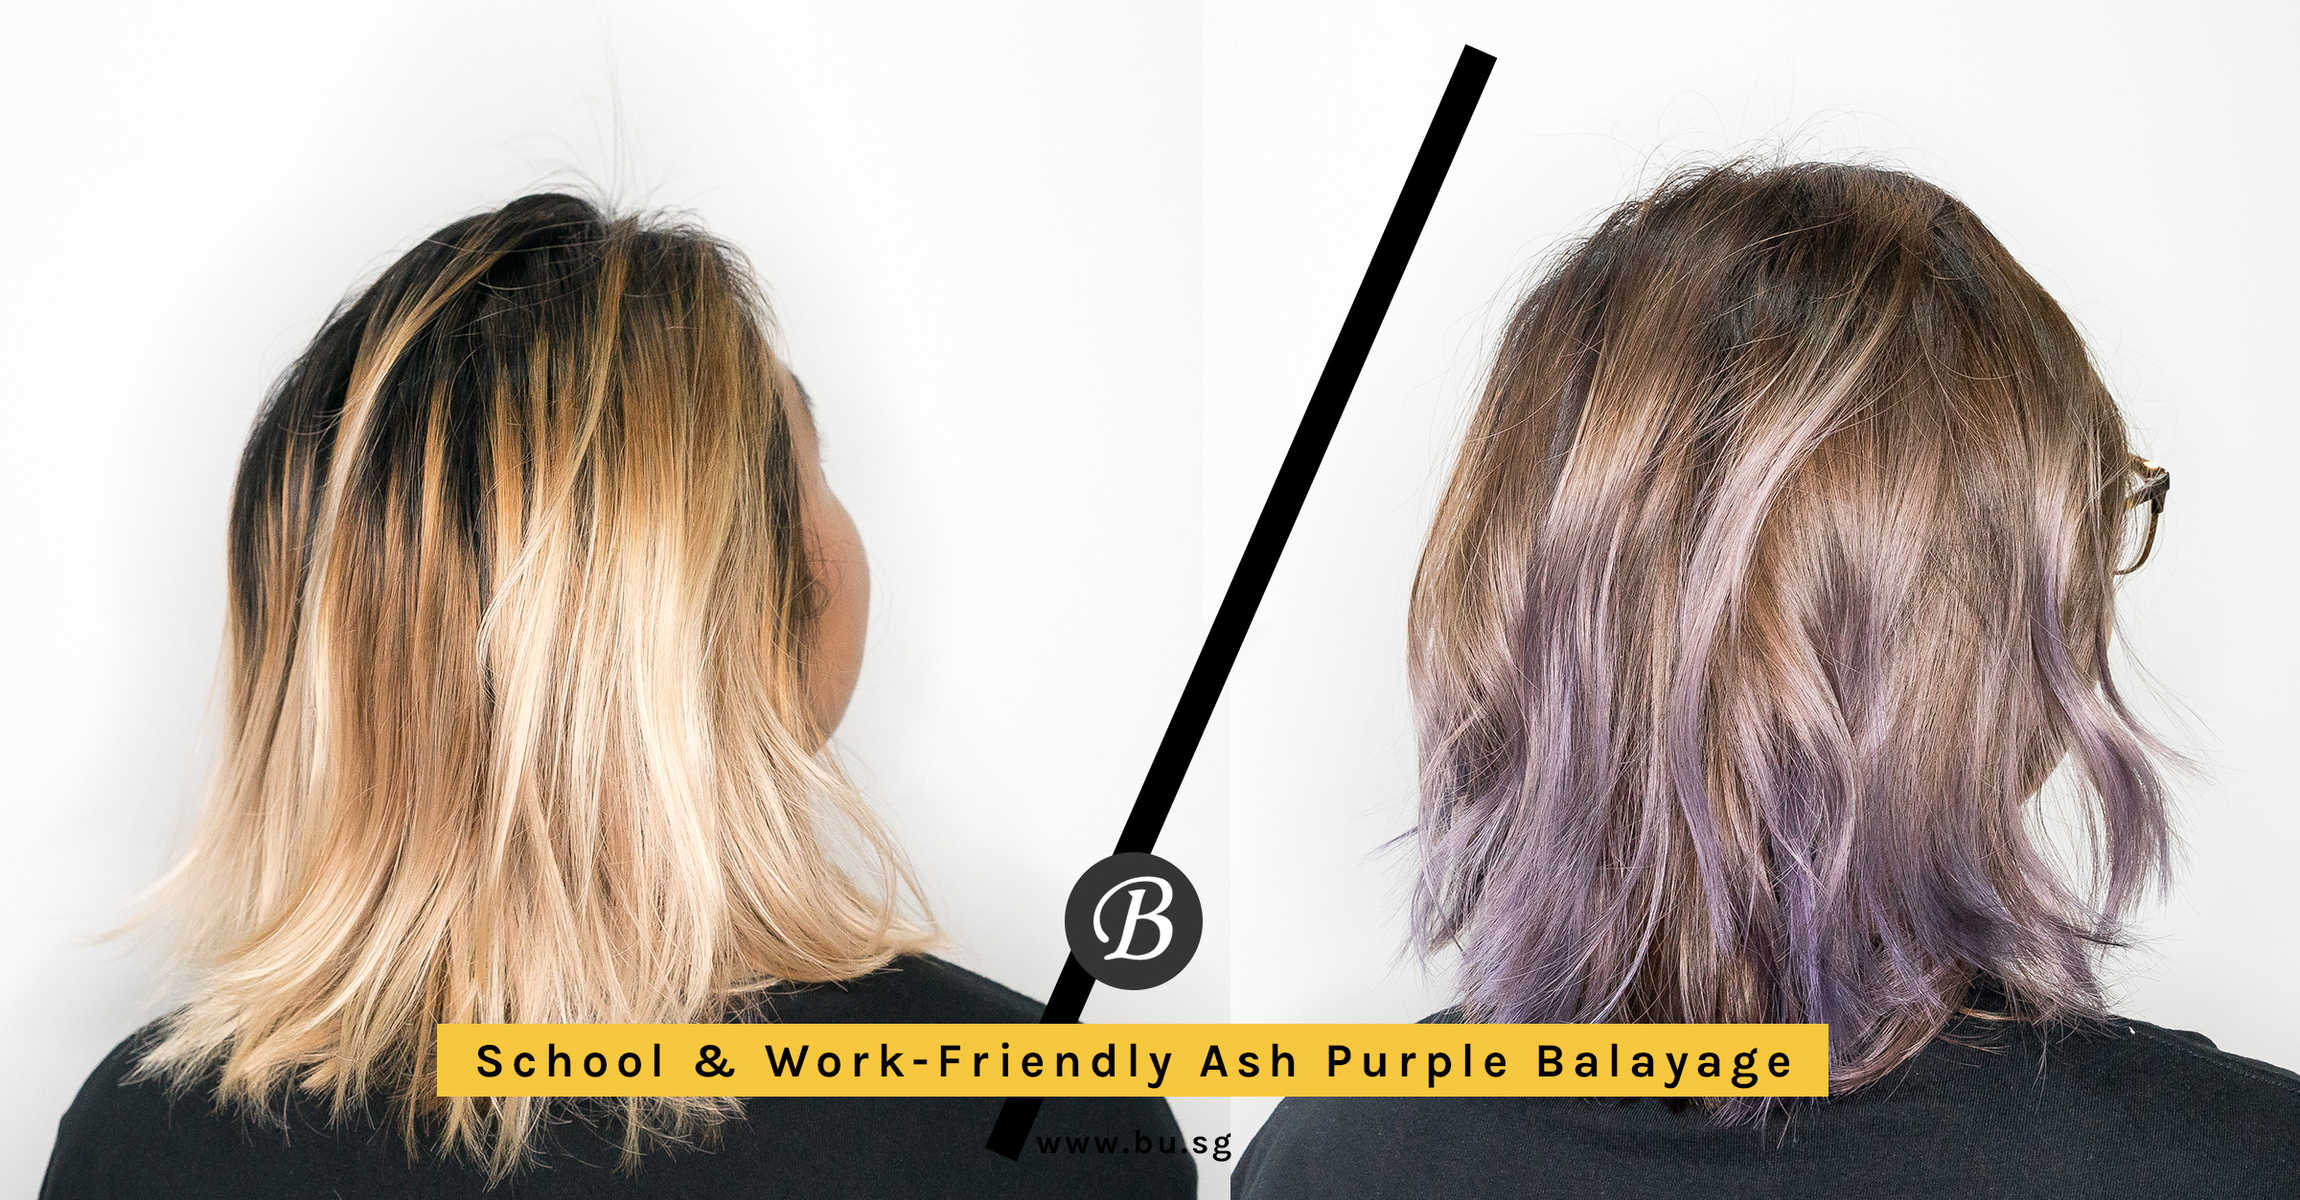 Sick Of Vivid Hair Colours Agent Cw Got Ash Purple Balayage At 99